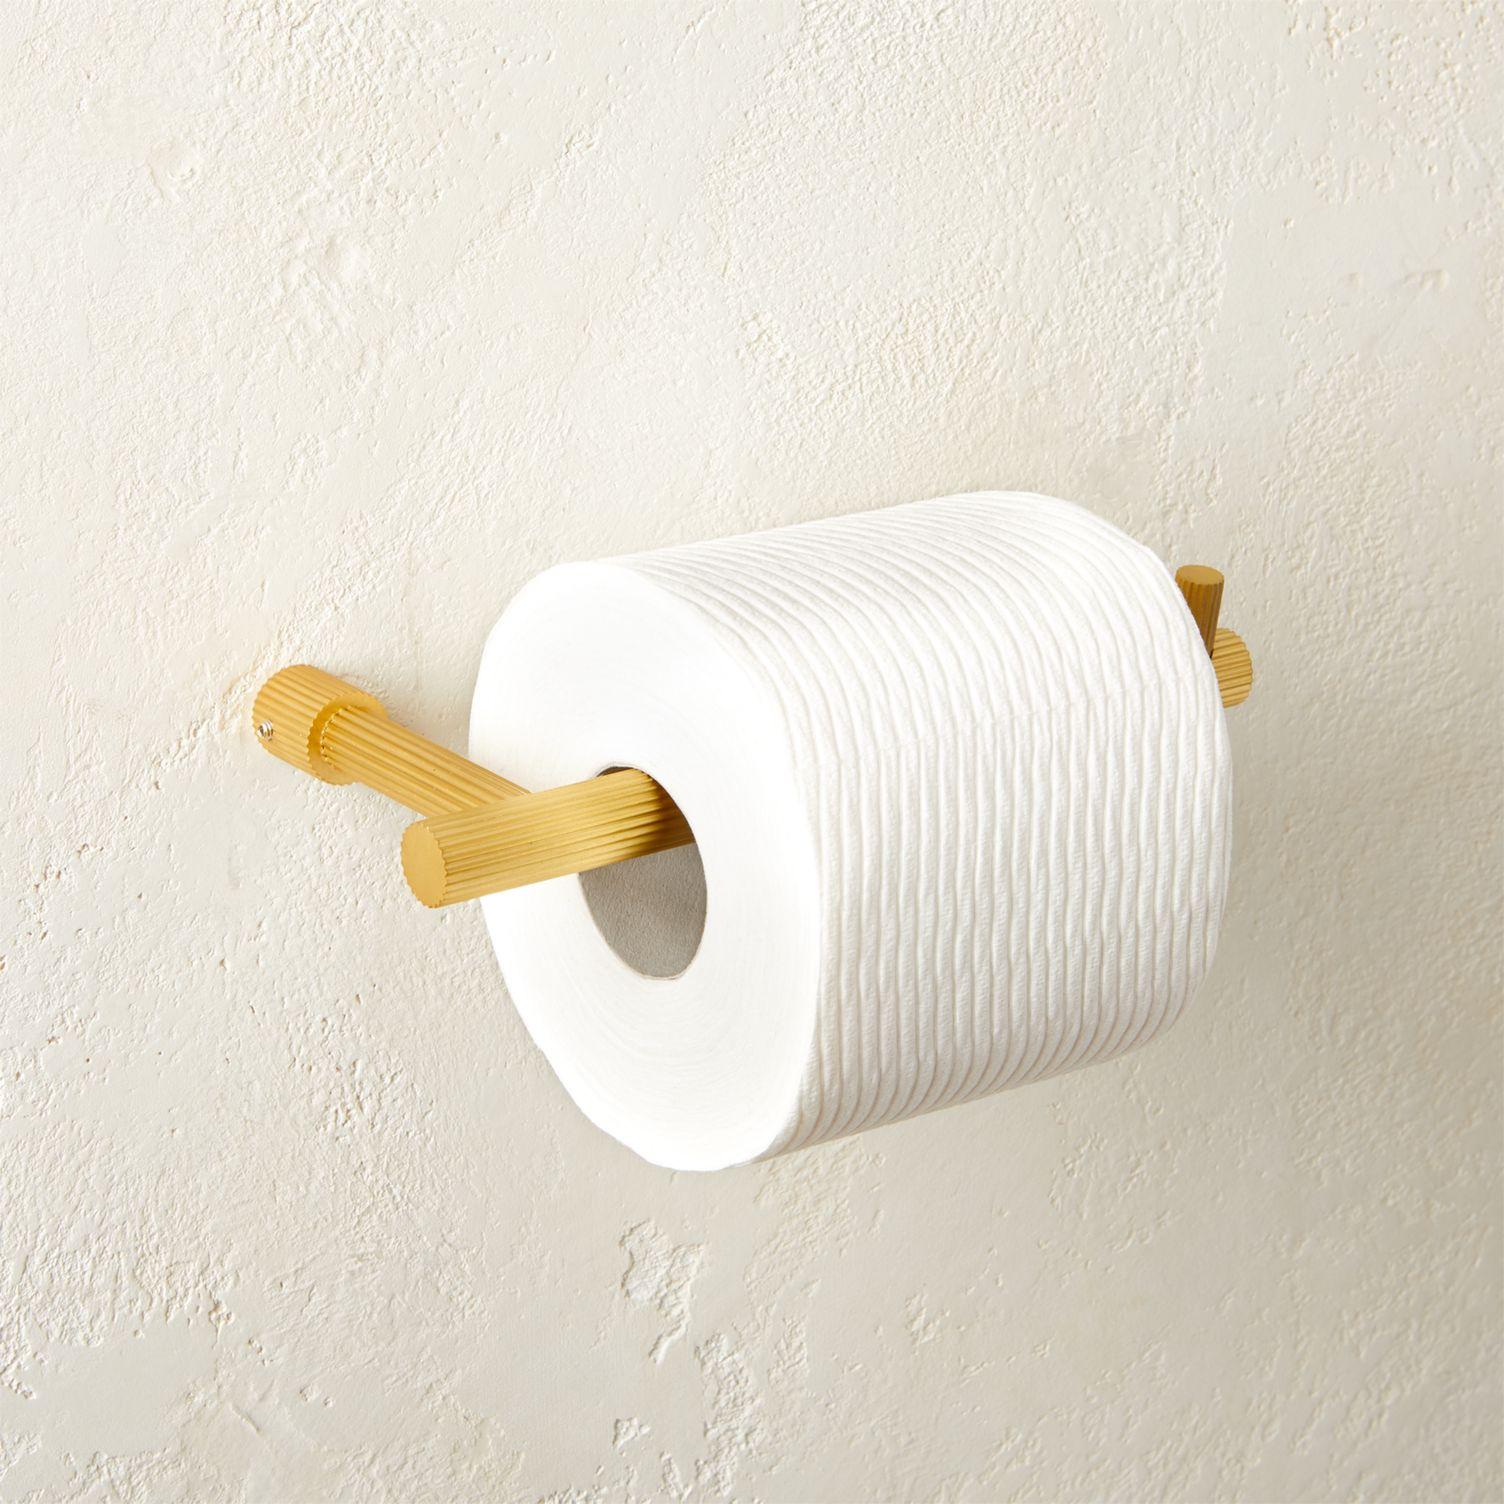 Ridged brass toilet paper holder